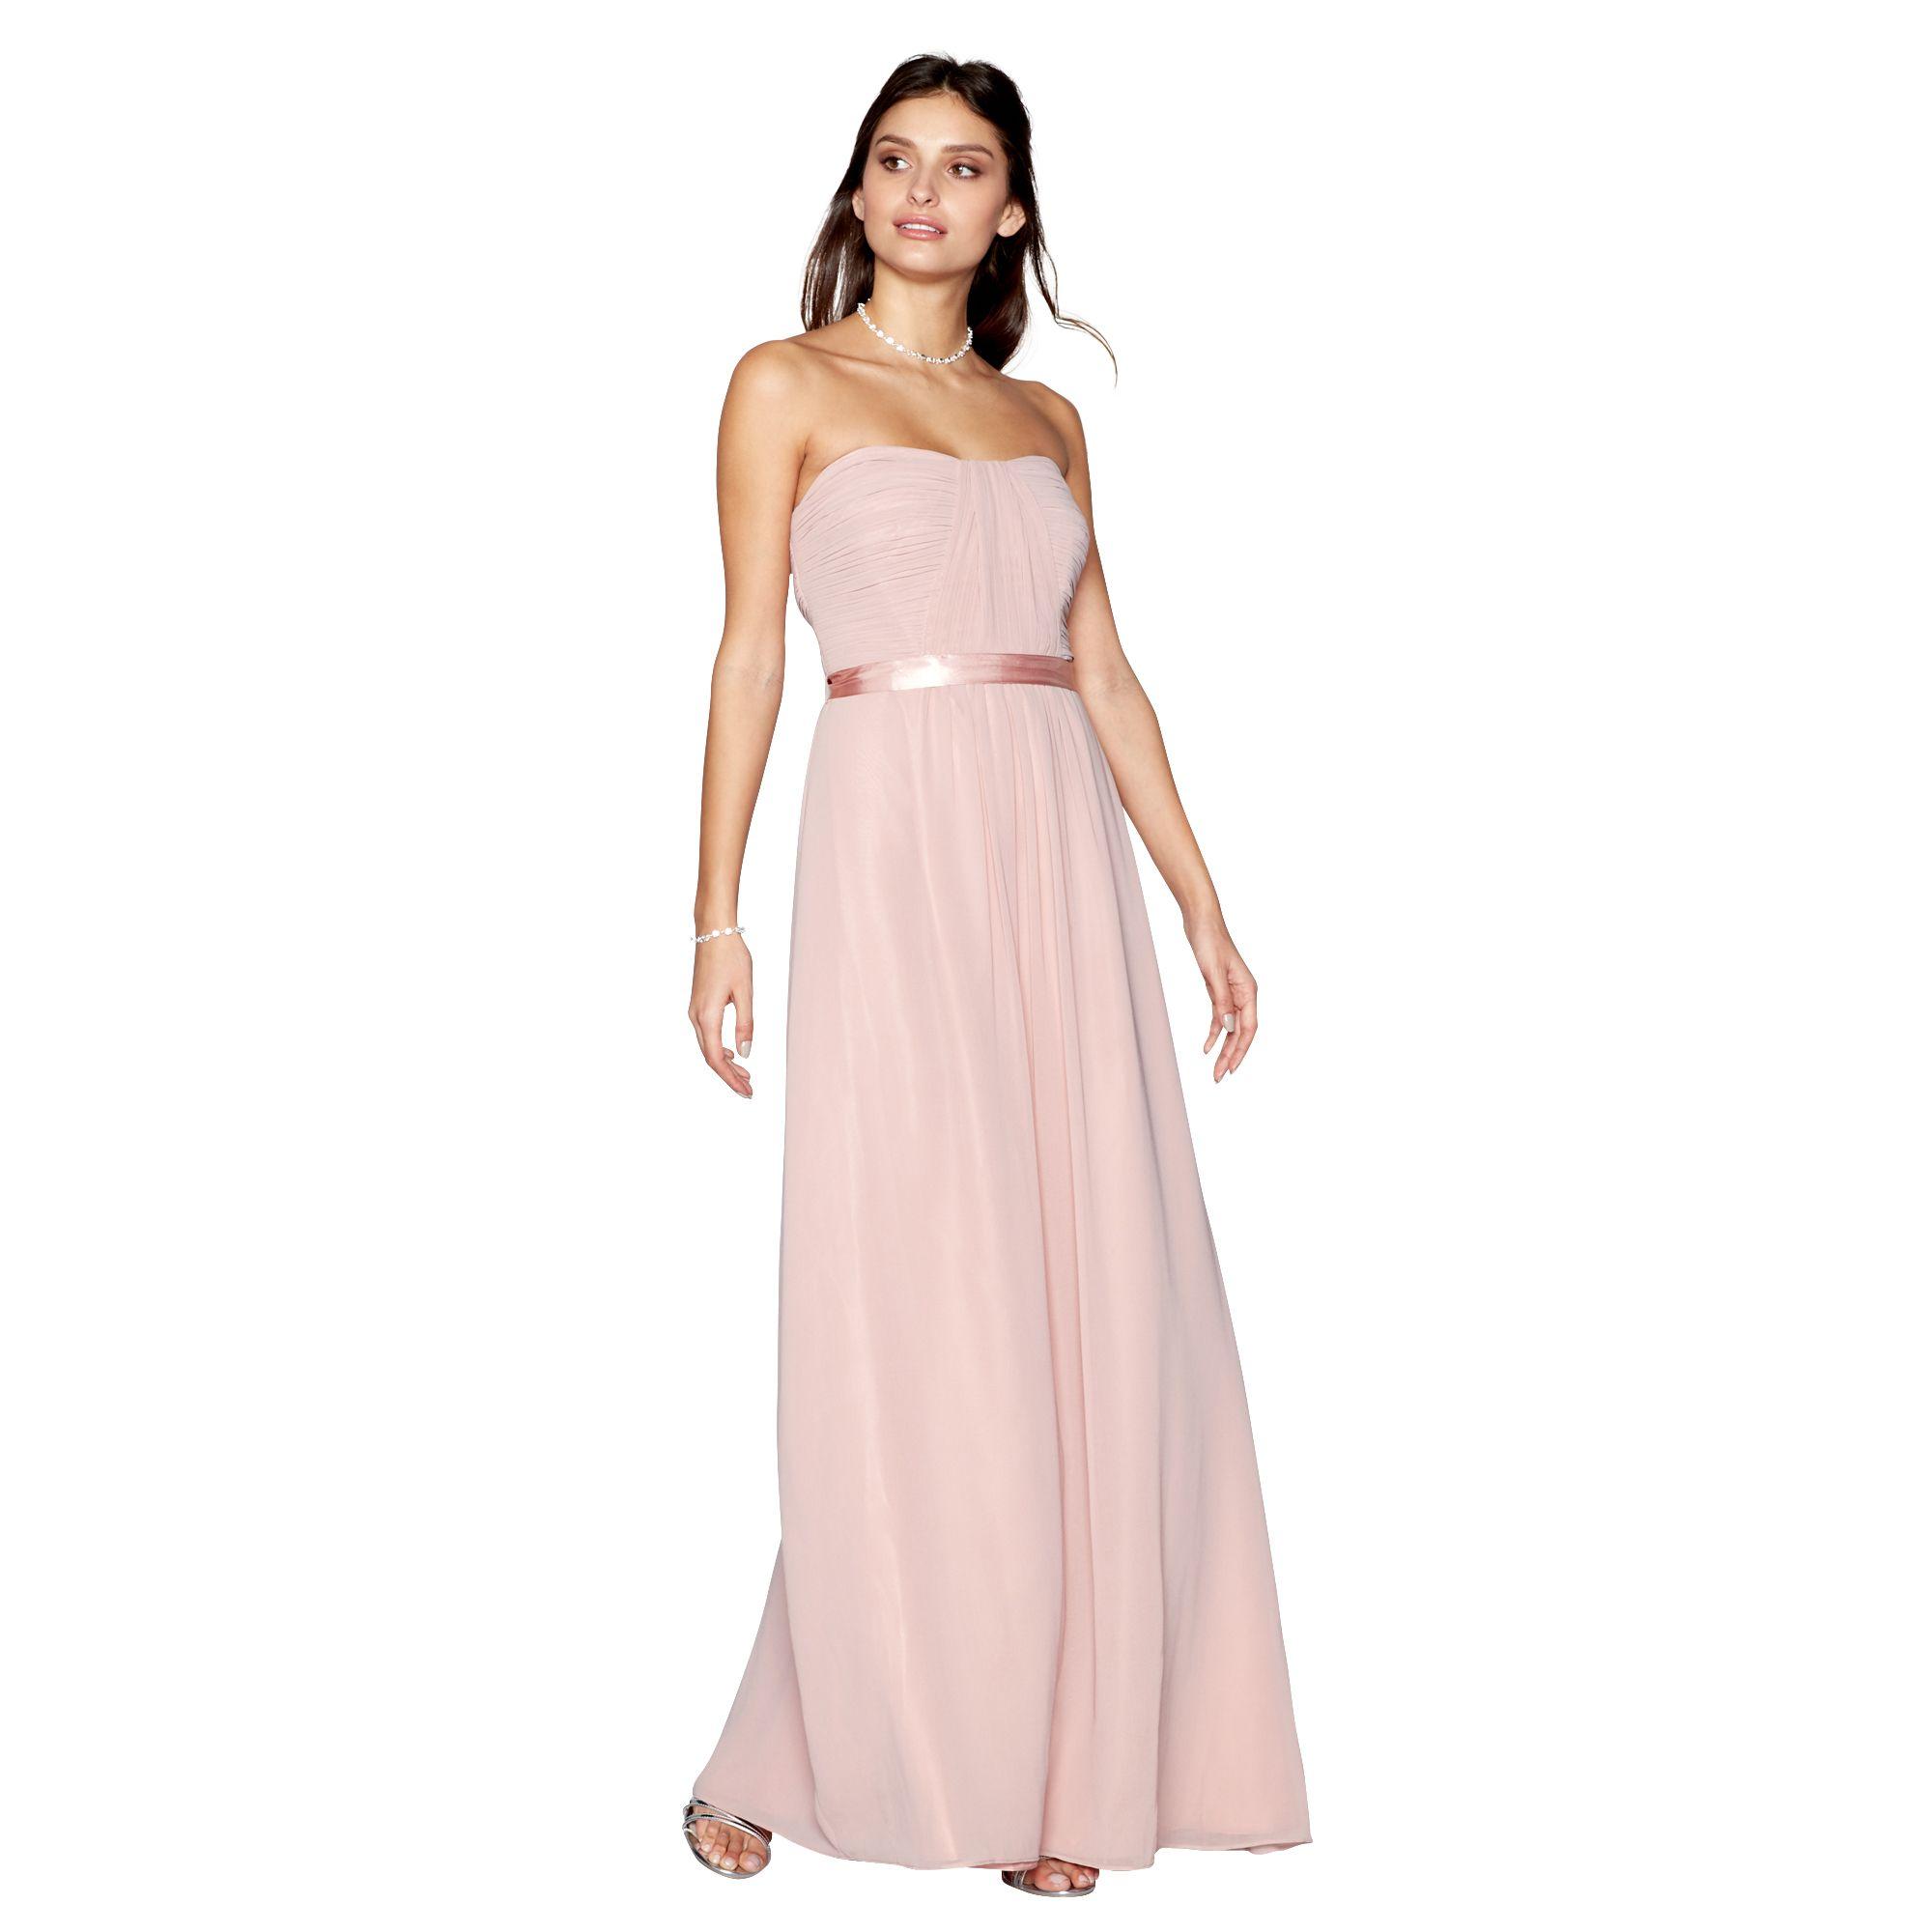 Debut rose dress ebay debut womens mid rose sophia bridesmaid dress from debenhams ombrellifo Image collections